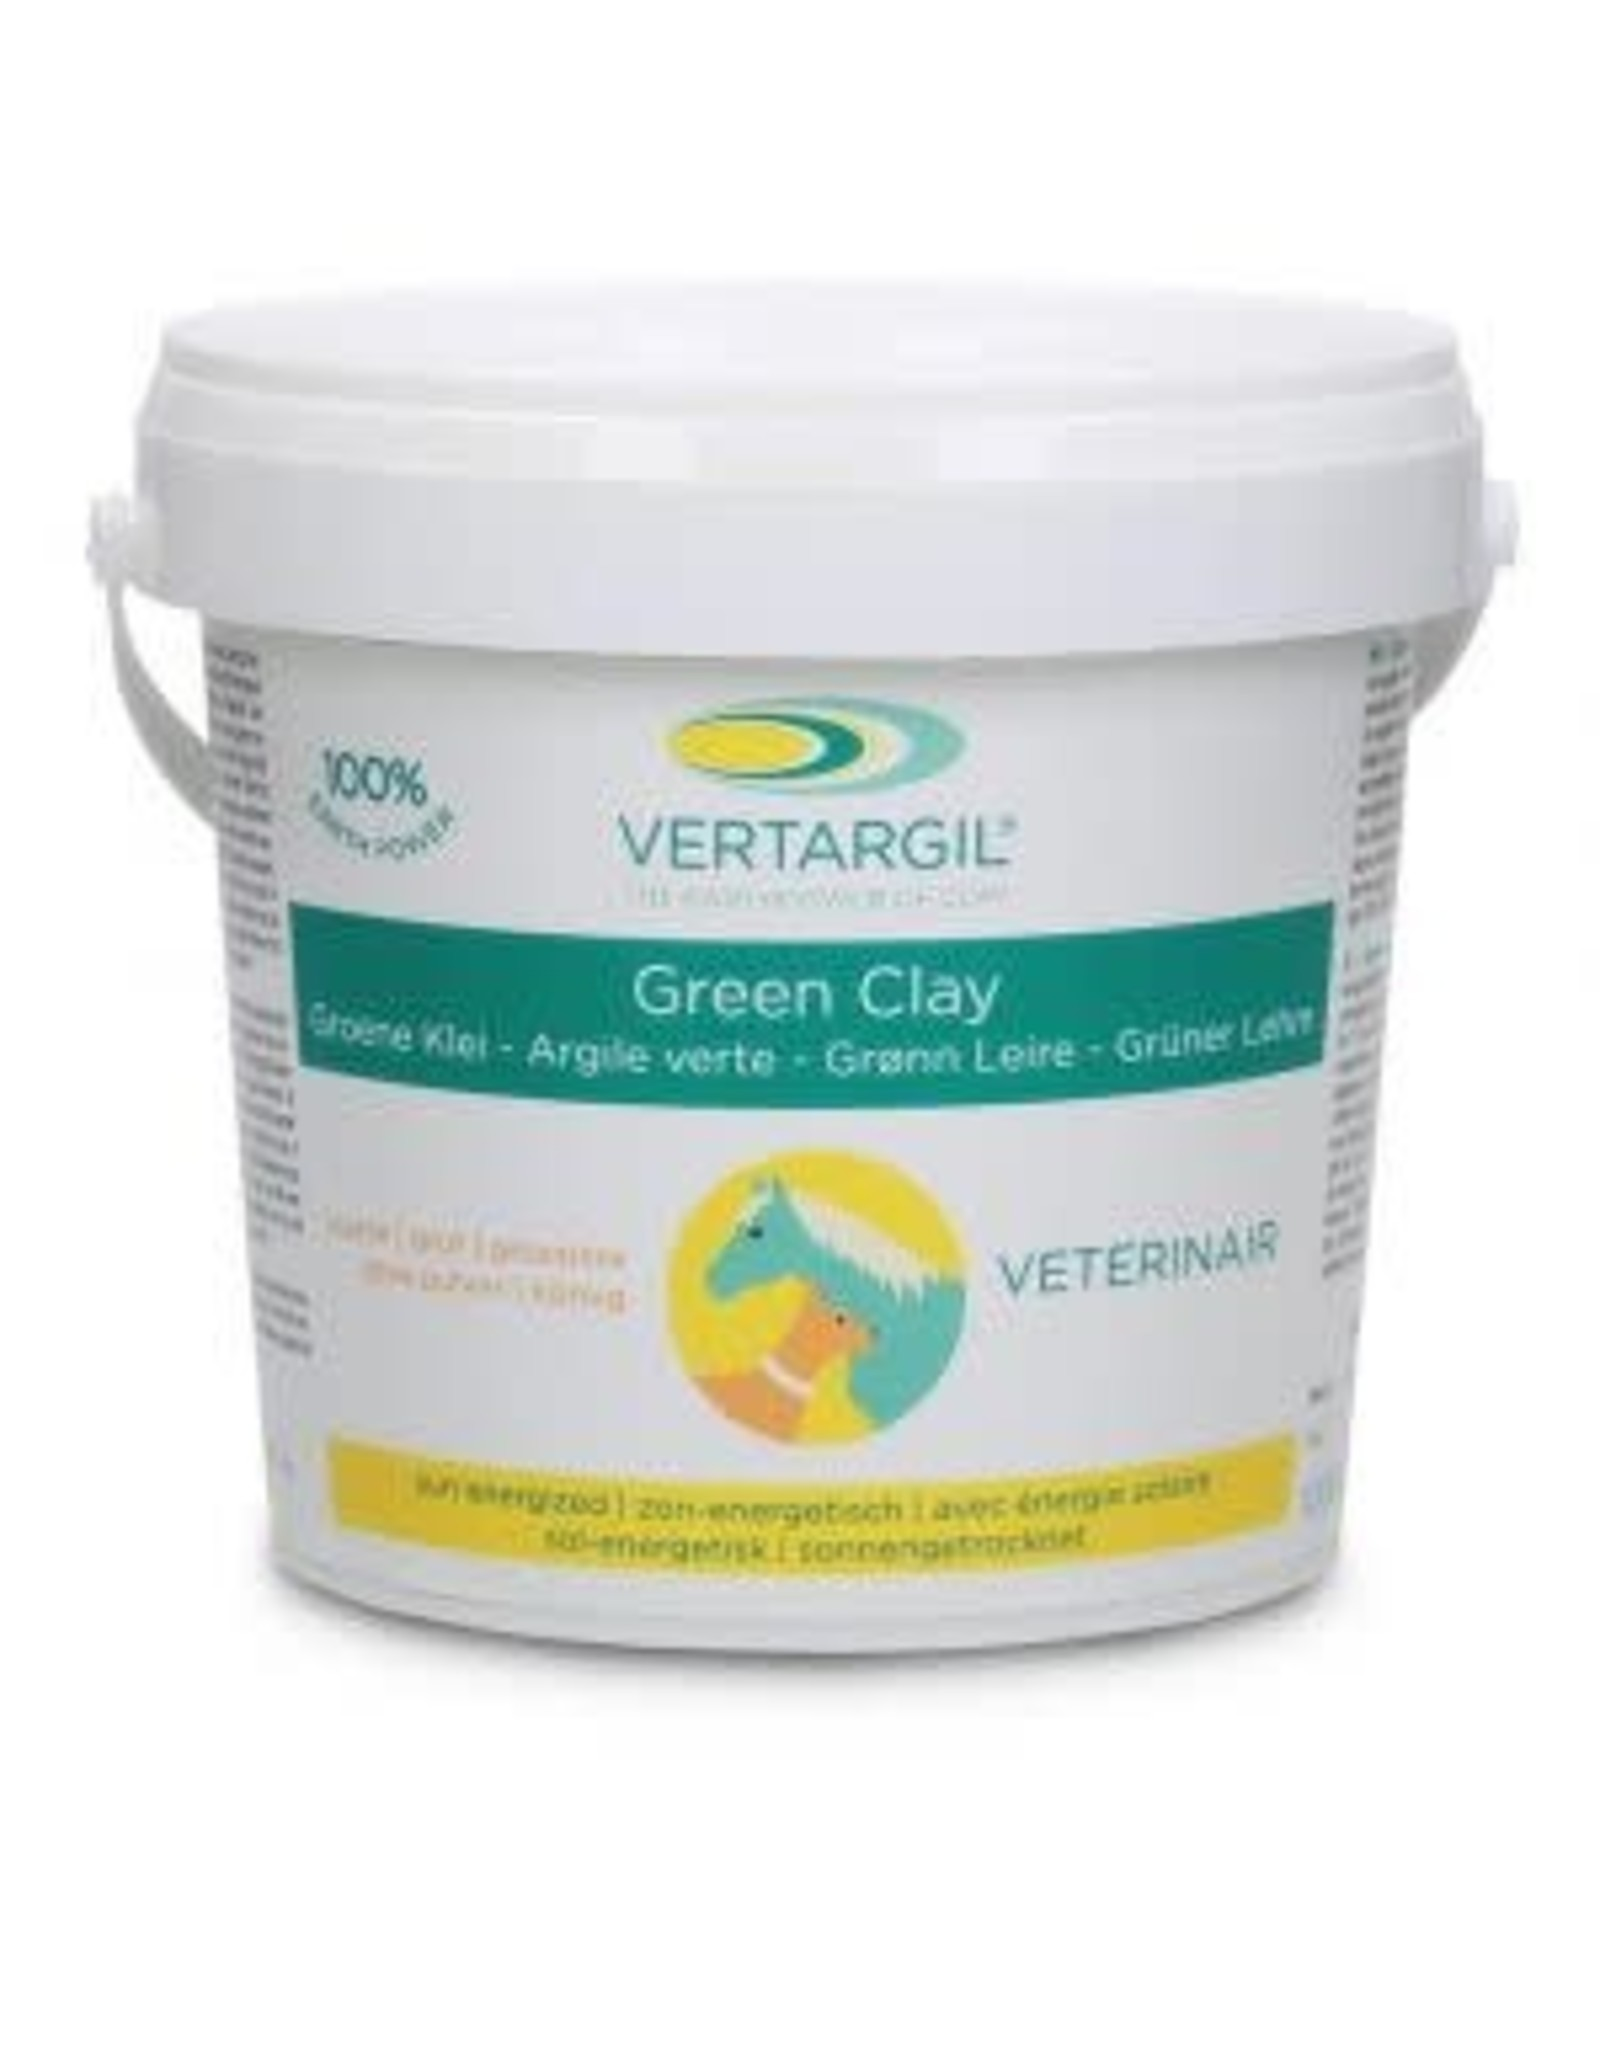 Vertargil Vertagril Green Clay 1kg